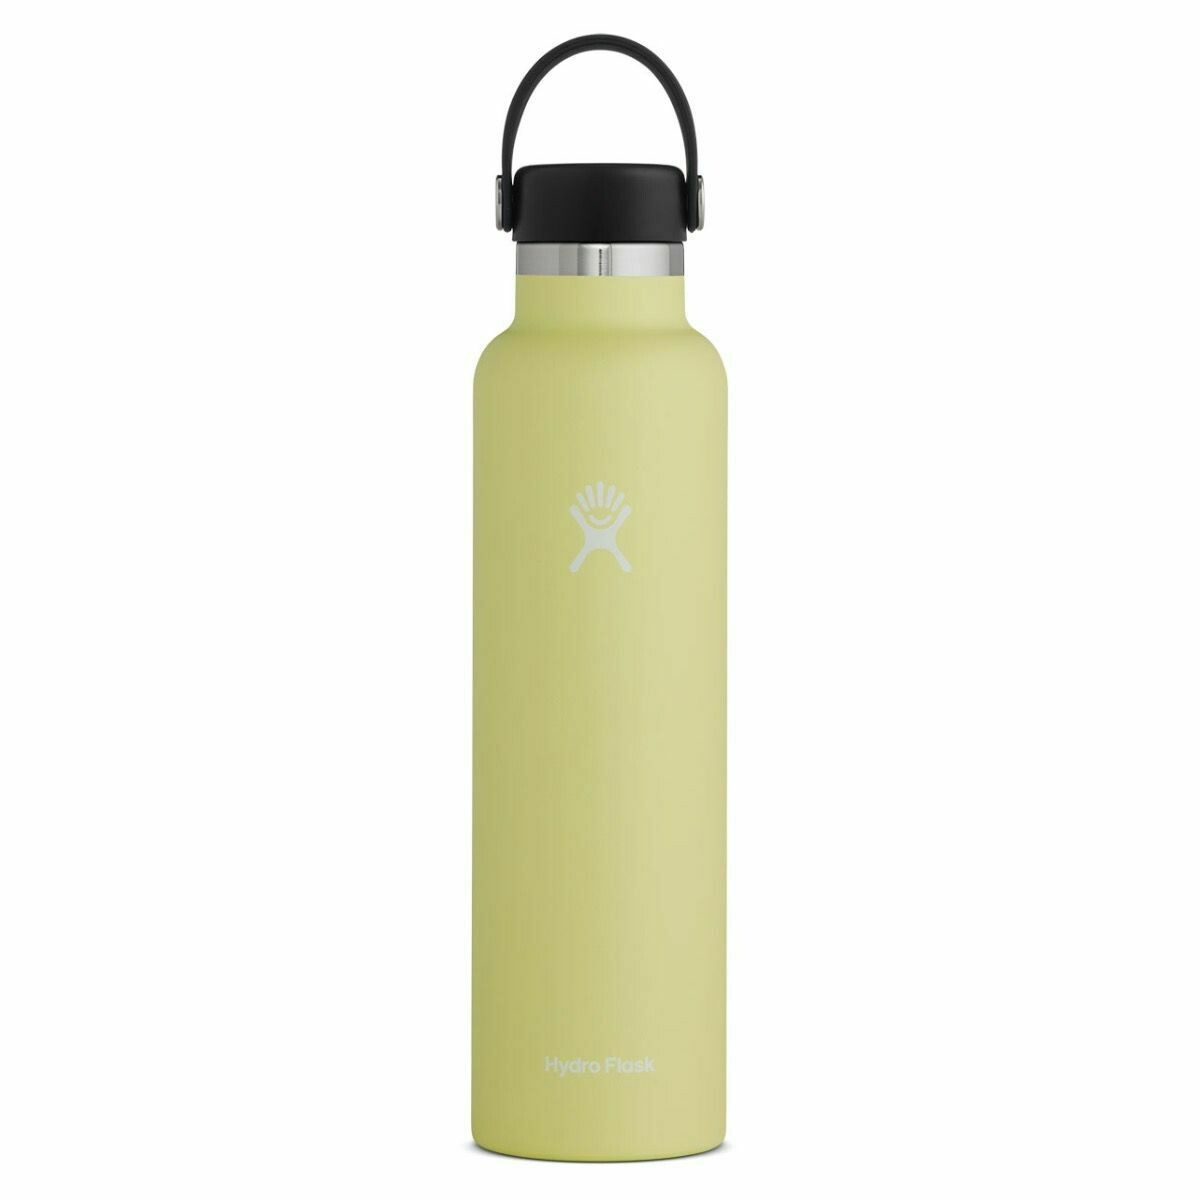 Hydro Flask 24 oz Standard Mouth w/ Flex Cap PINEAPPLE